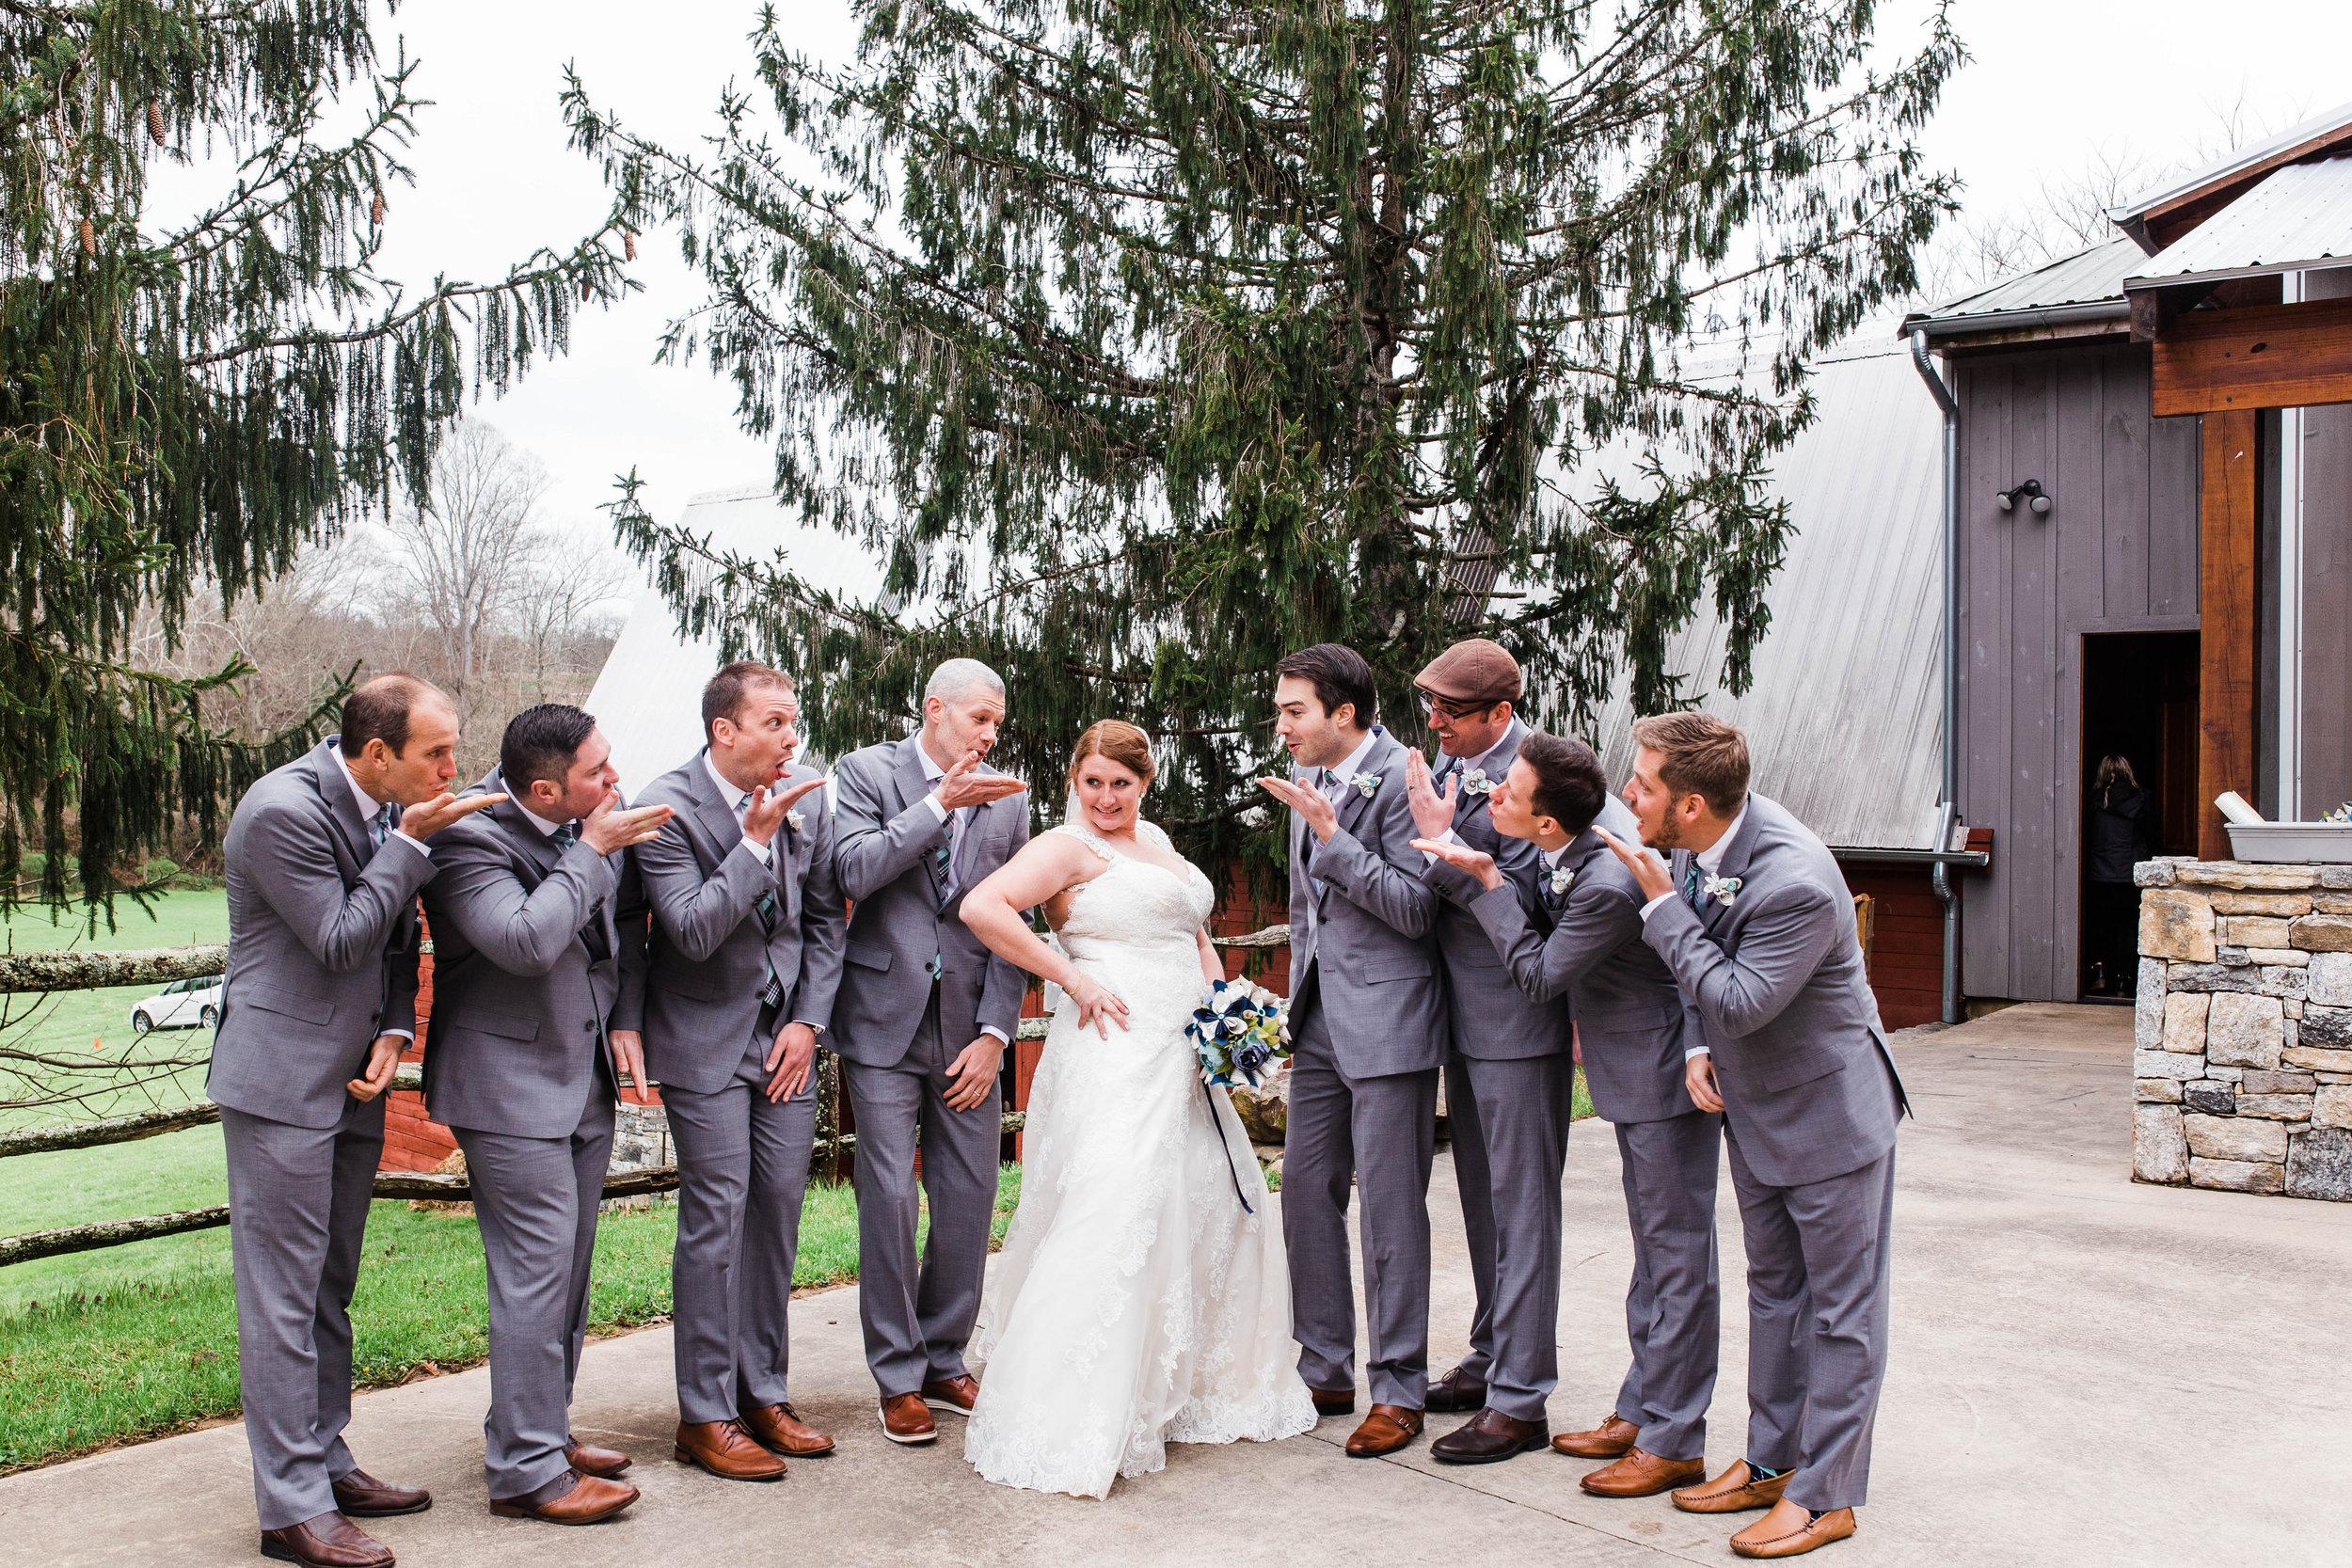 Honeysuckle-Hill-Weddings-Andrew-Rachel-102.jpg